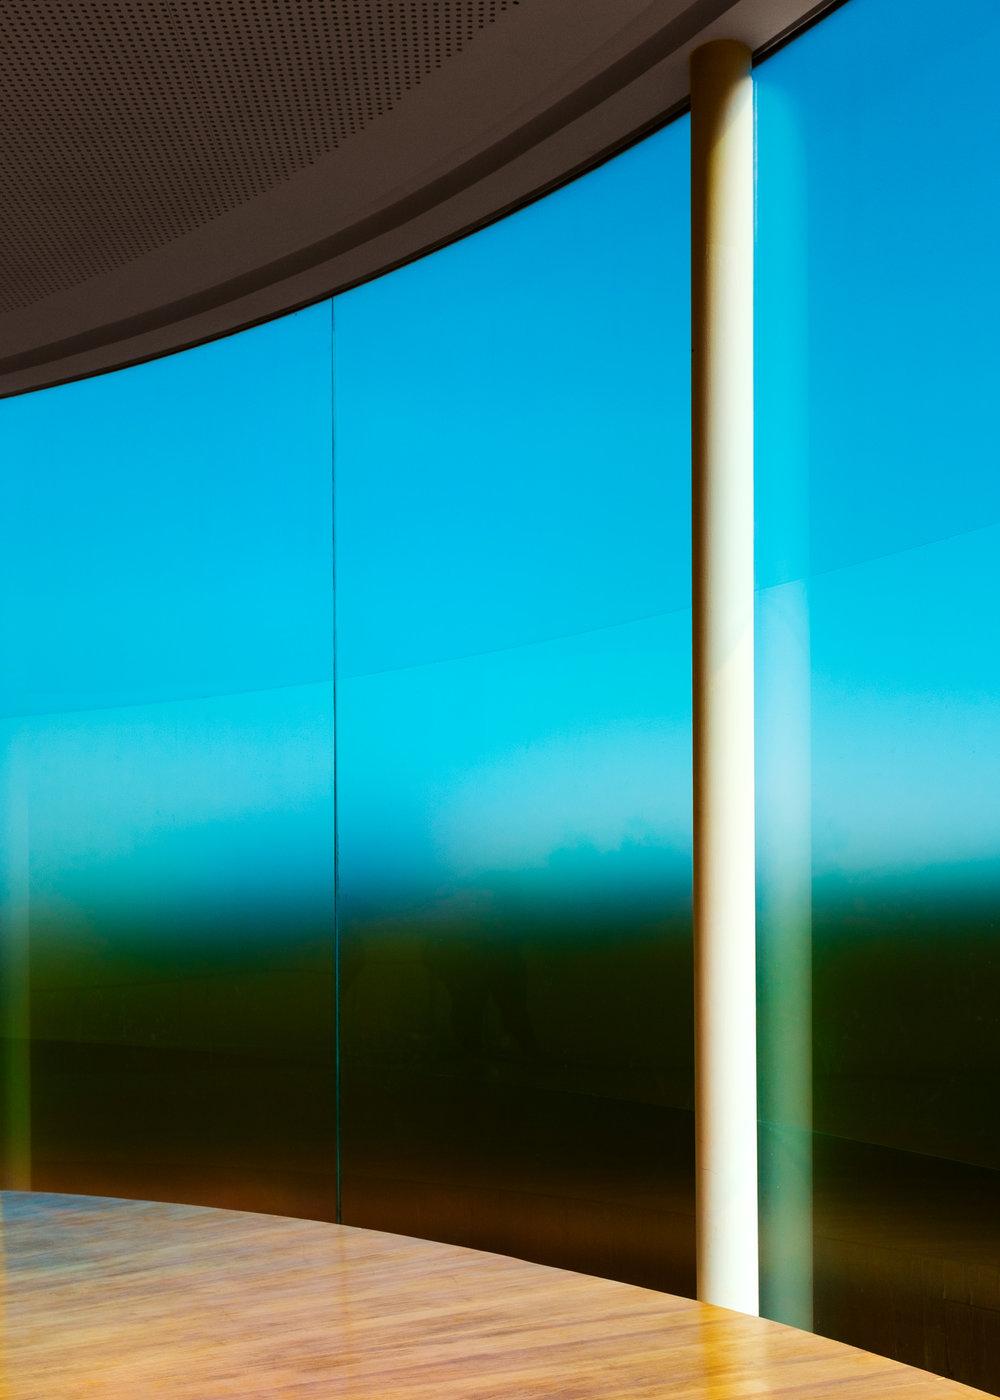 Sonic Pavilion - Doug Aitken